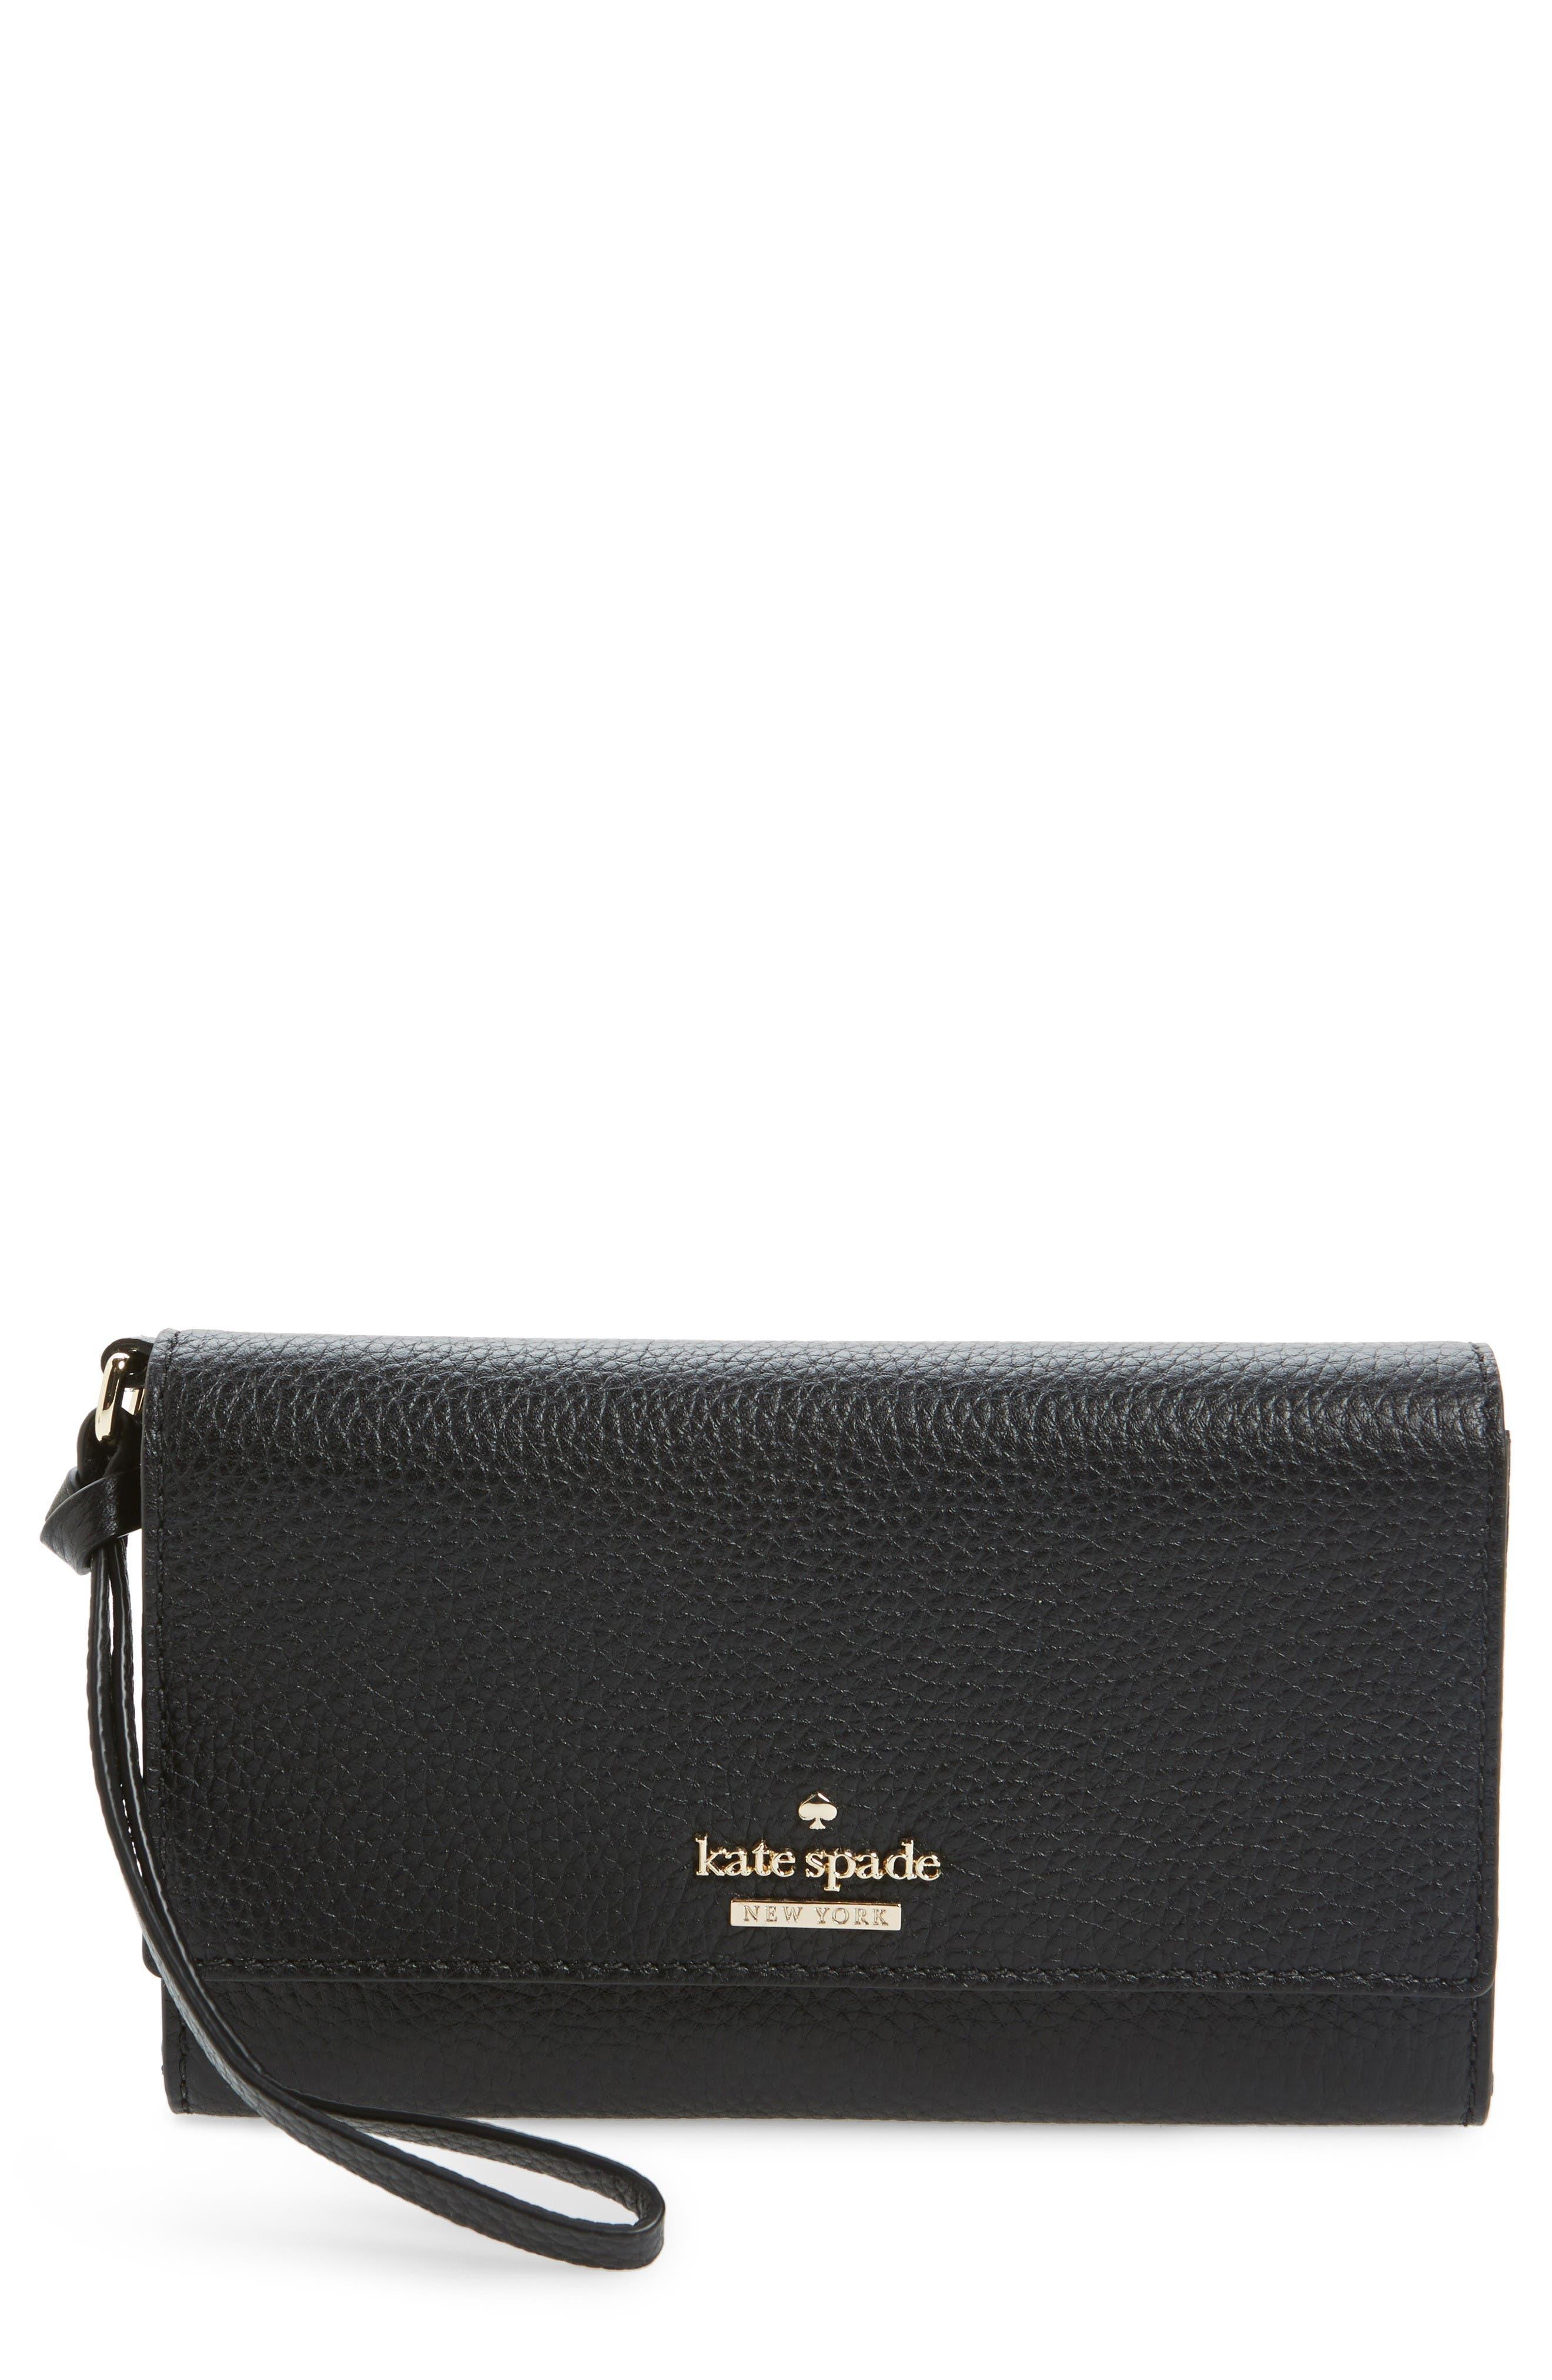 kate spade new york jackson street malorie leather wallet